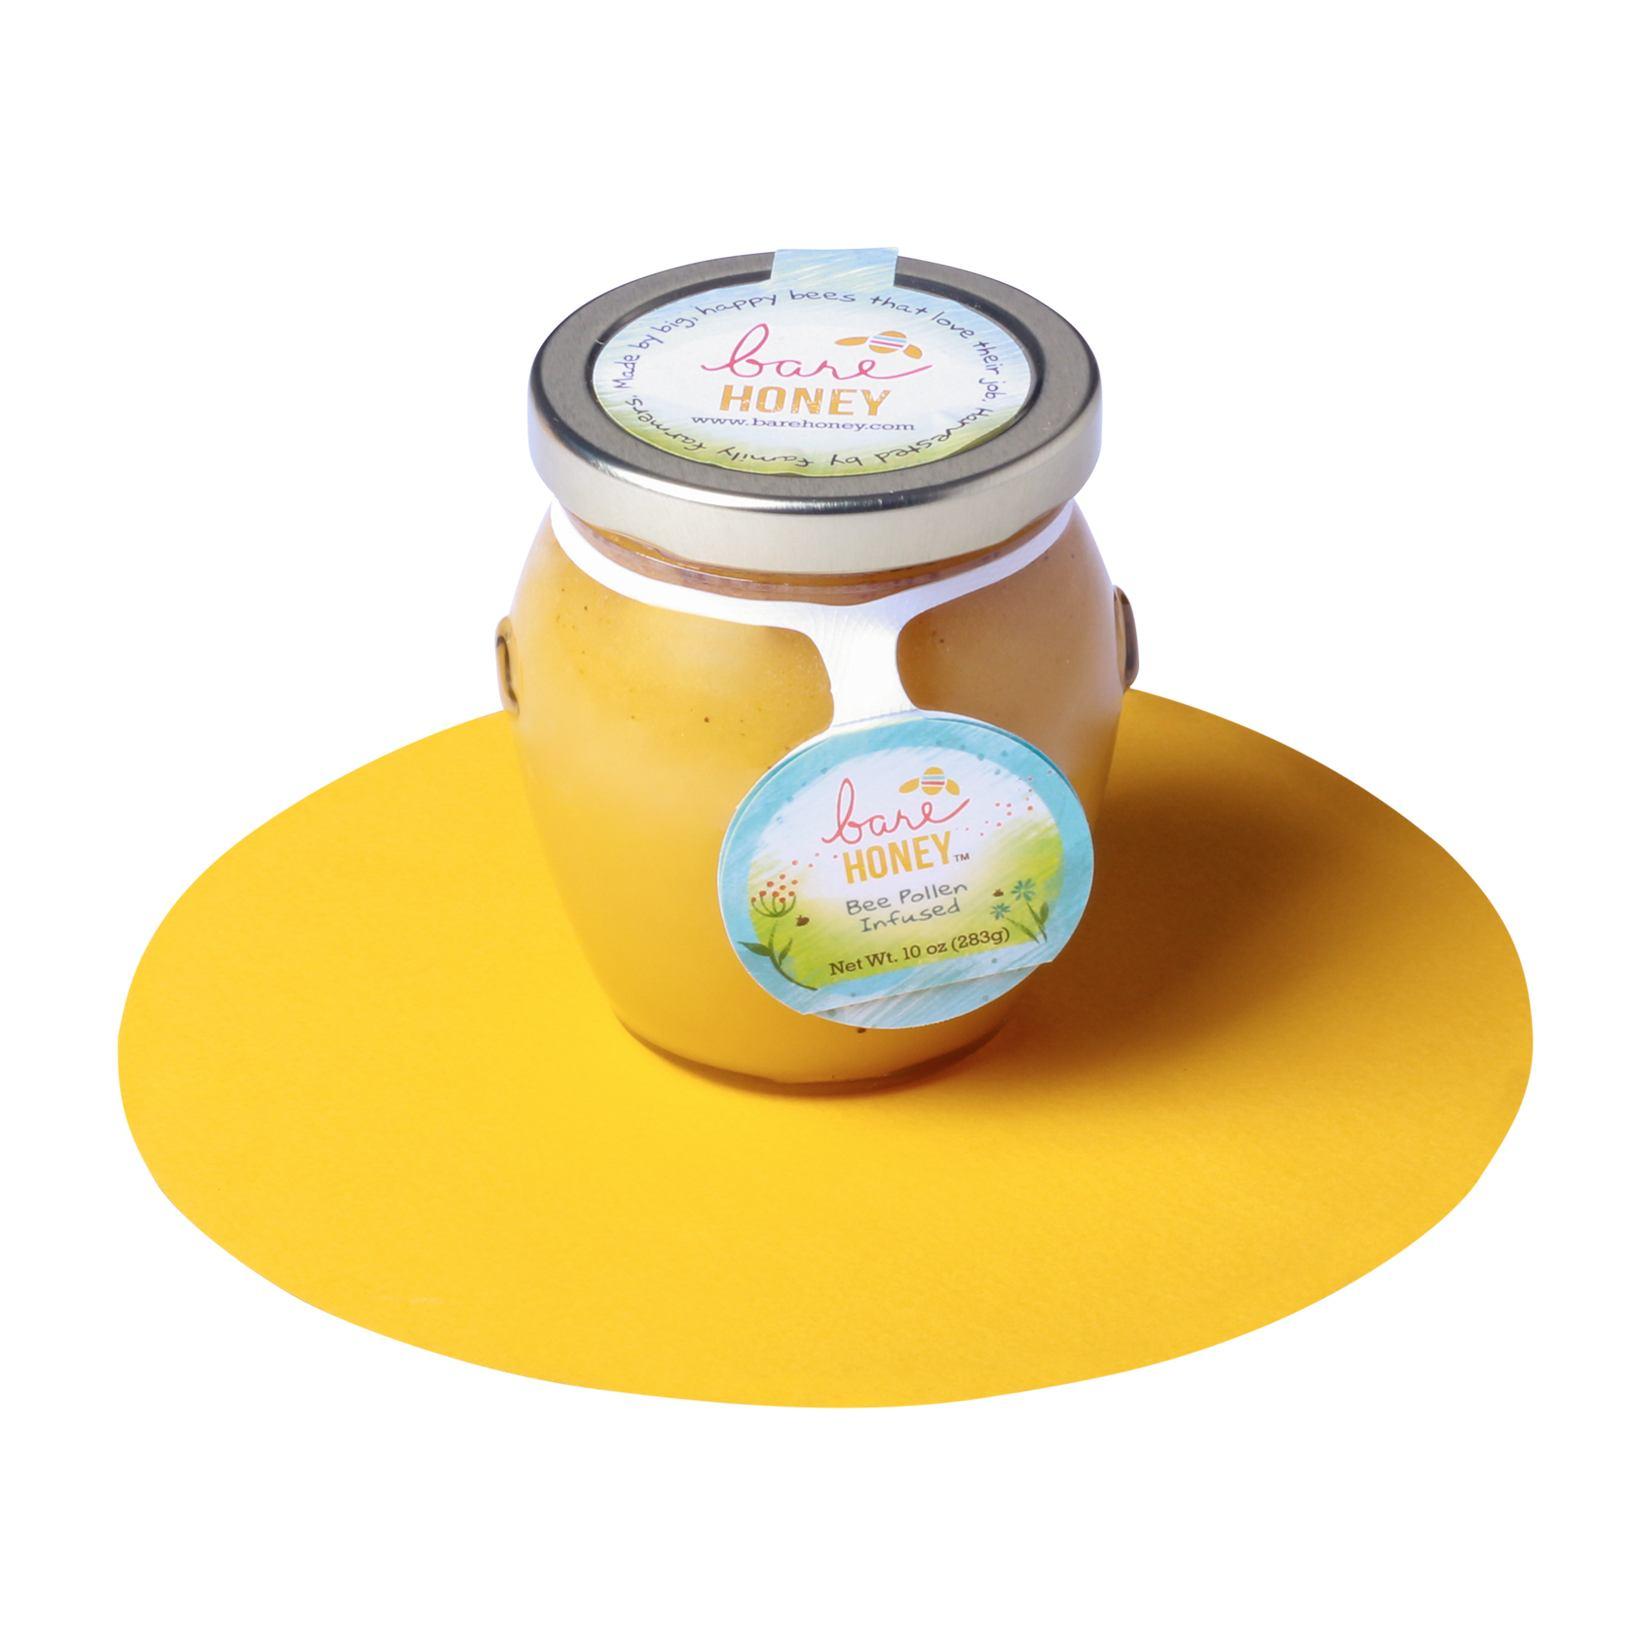 Bare Honey-Bee Pollen Infused Honey